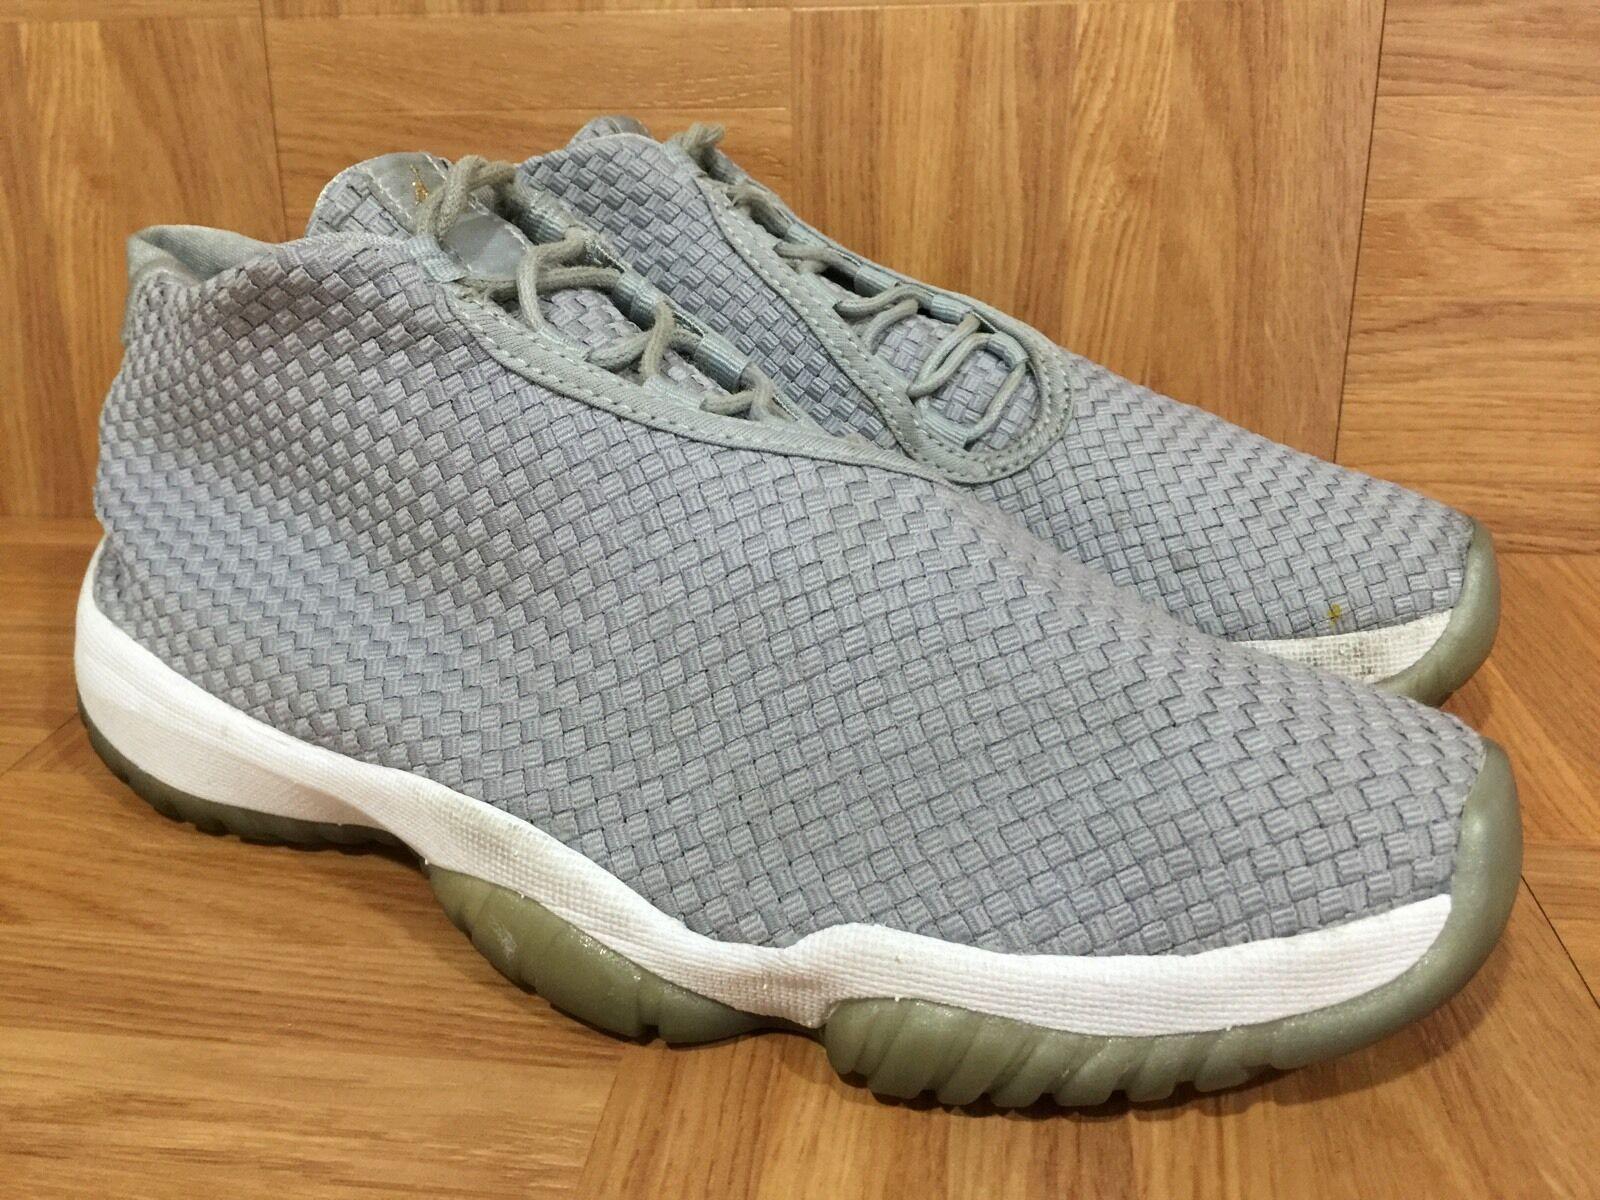 Nike air jordan tessuti rari futuro lupo grigio sz 656503-004 uomini fuori dal campo